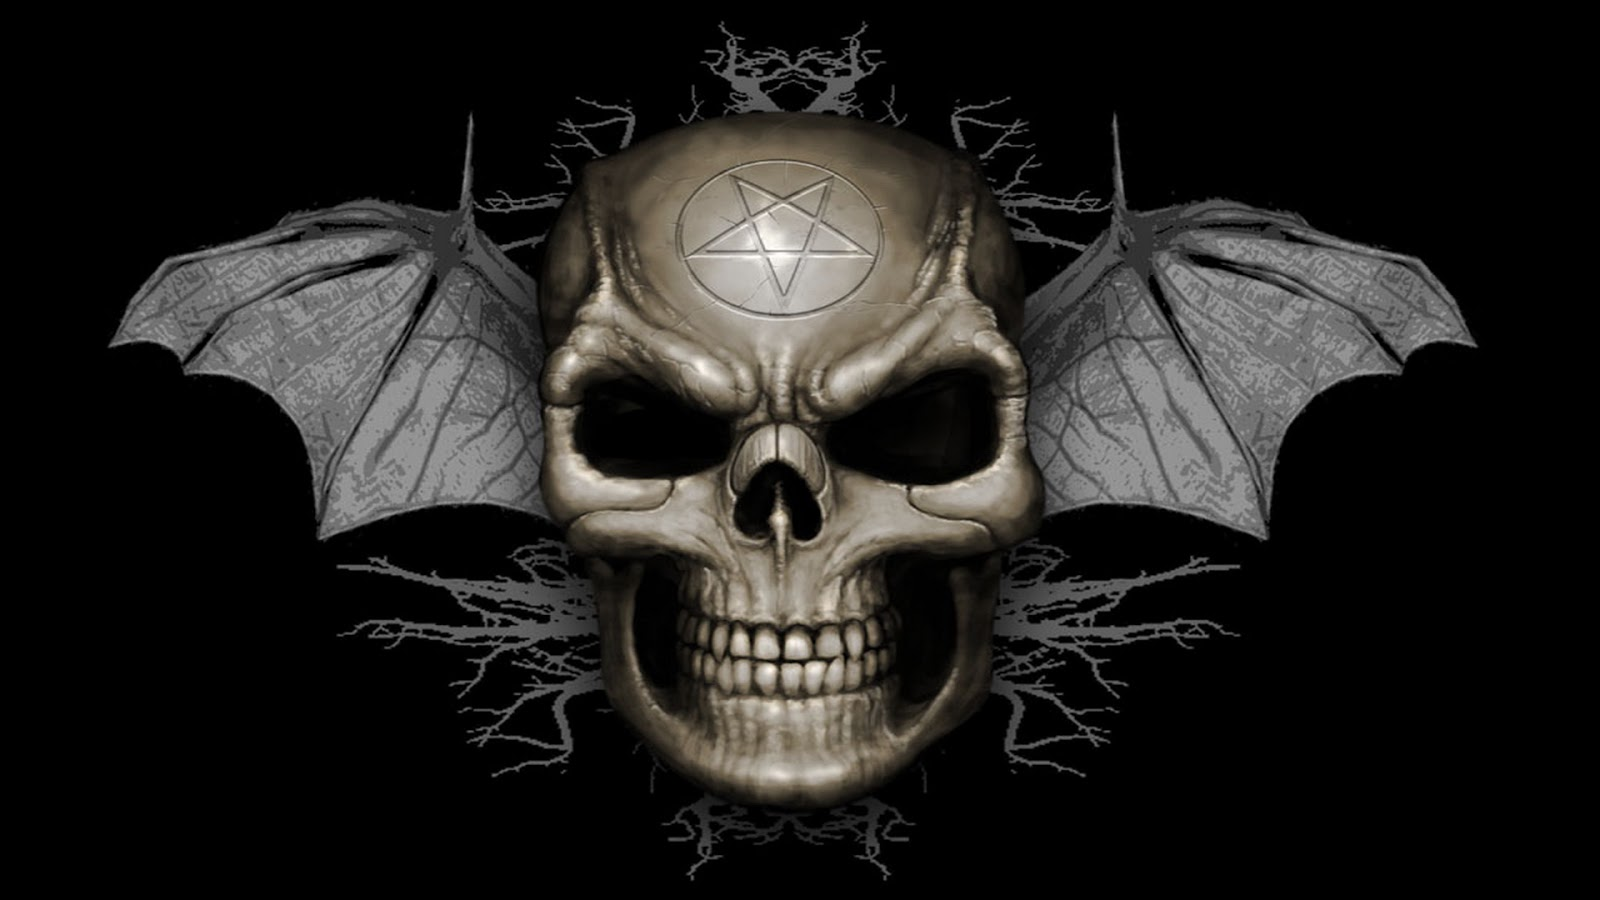 Hd Skull Wallpapers 1080p: 1920x1080 Skull Laptop Full HD 1080P HD